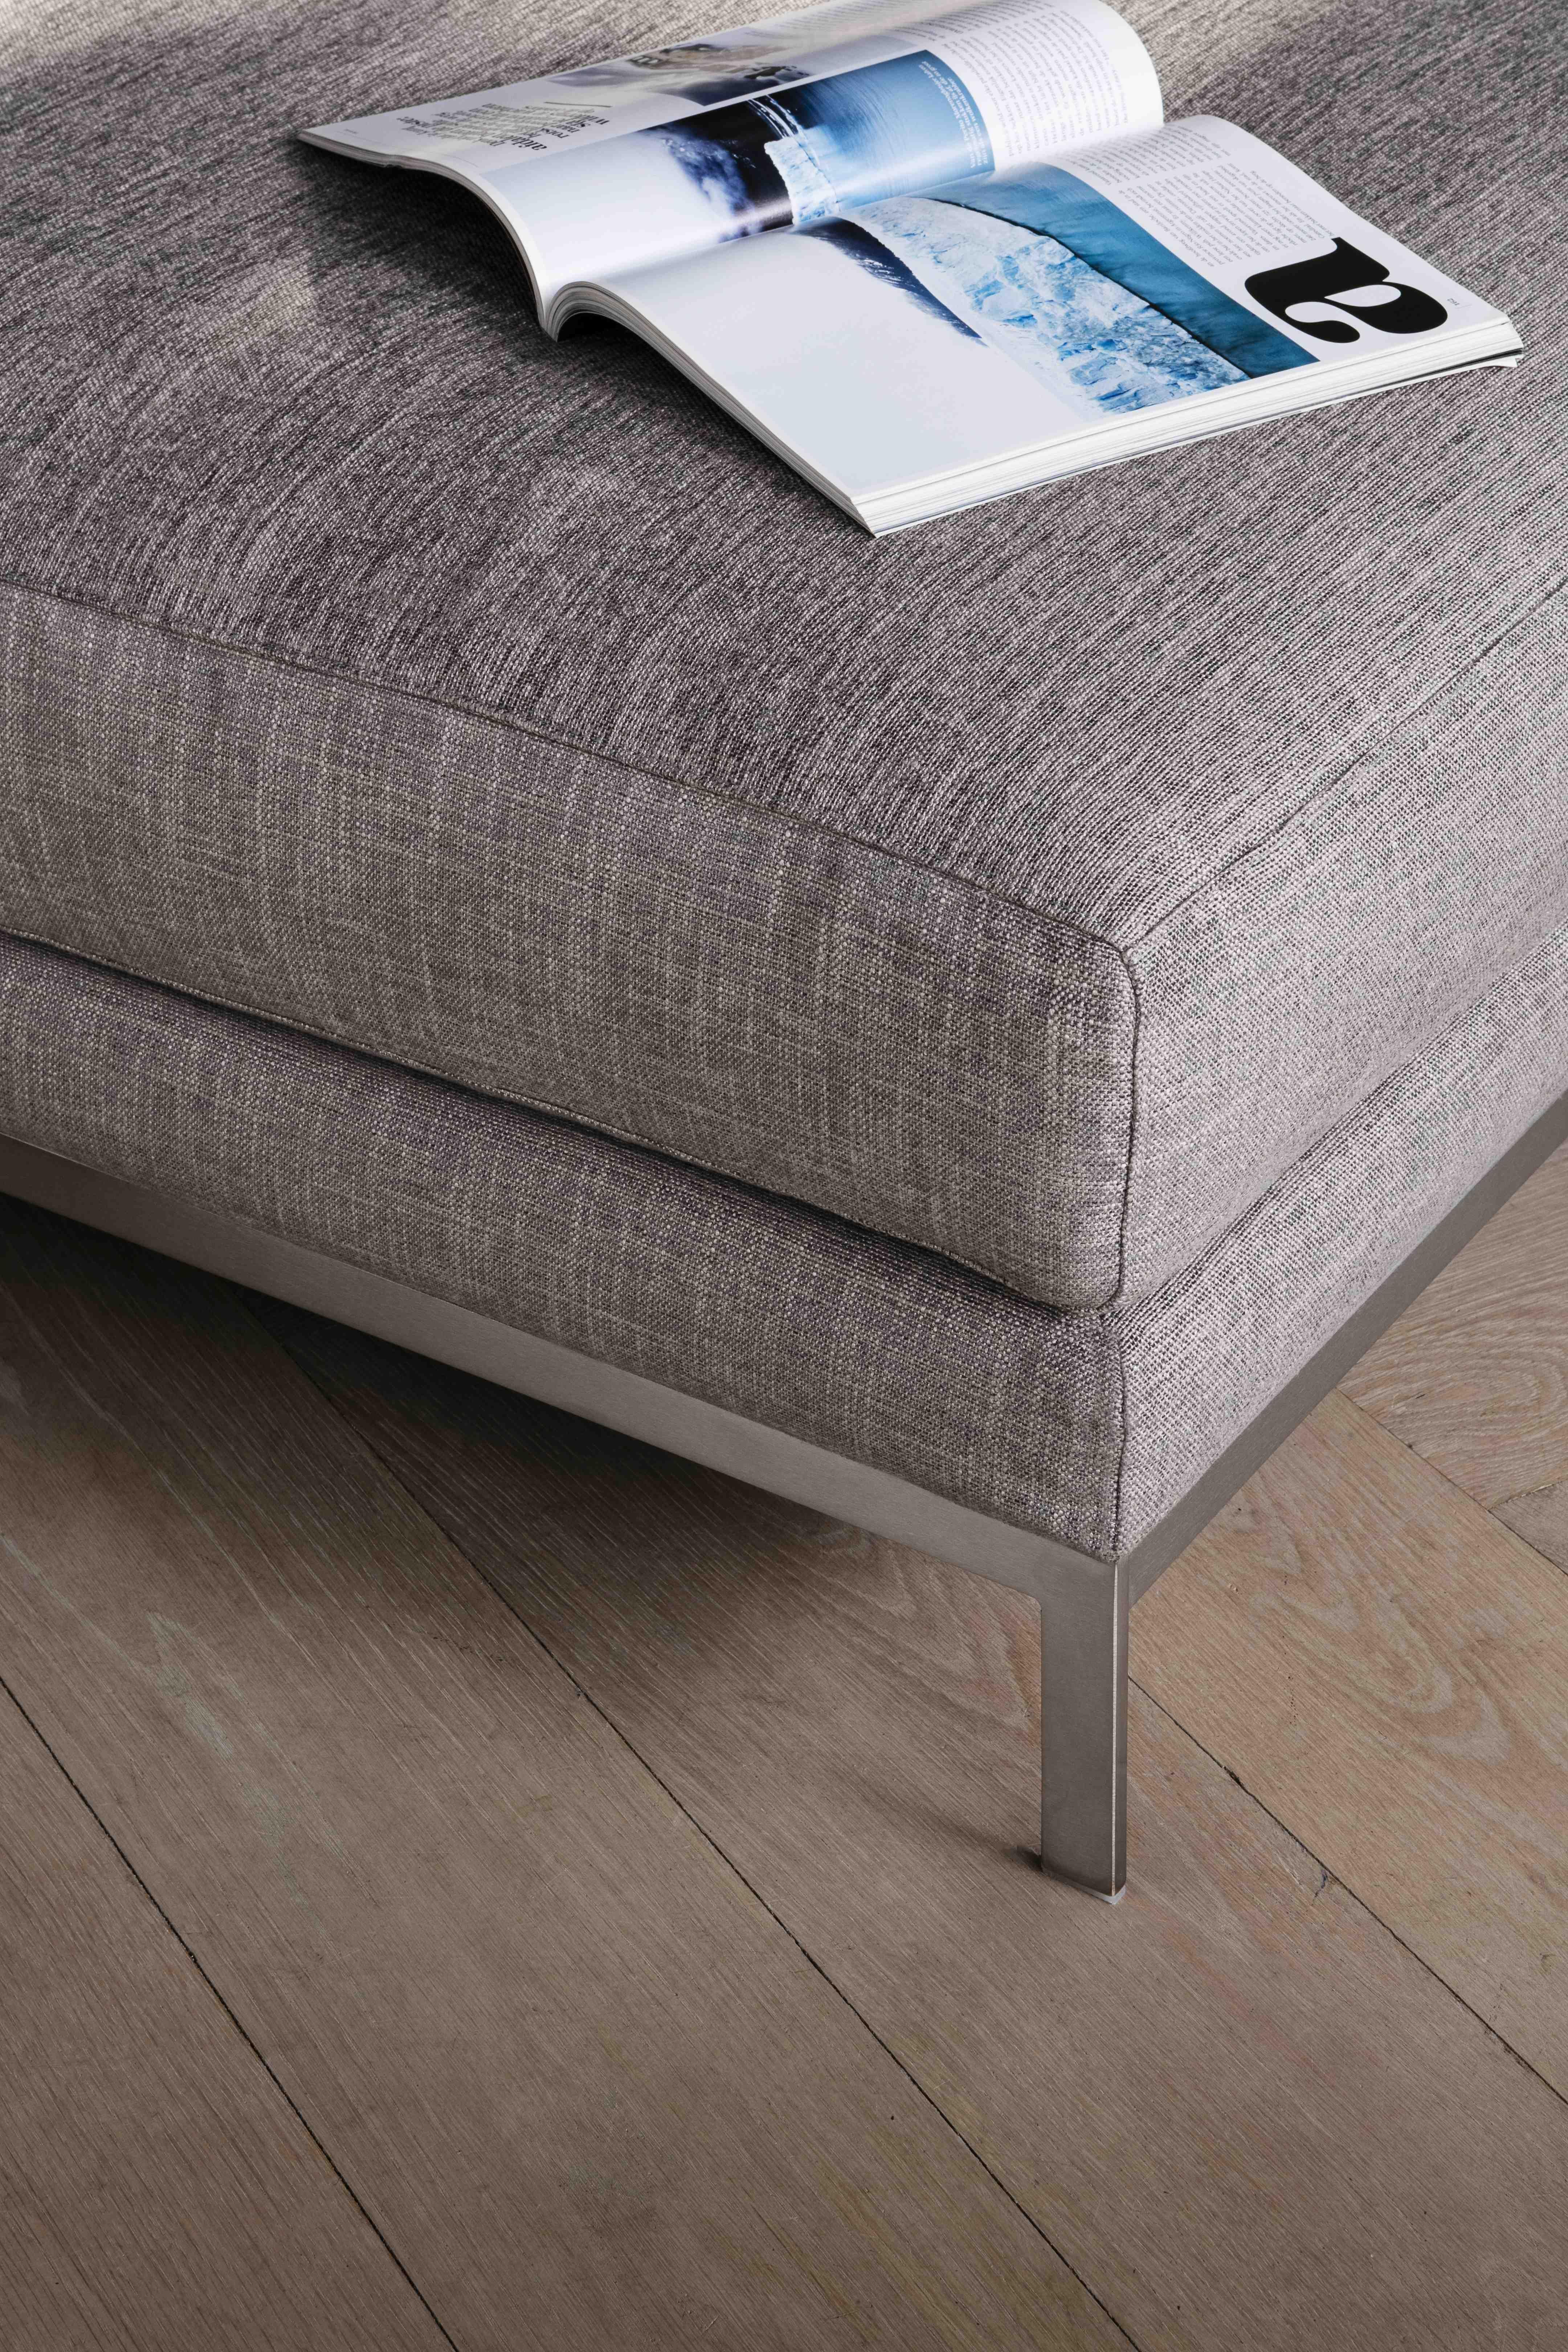 Linteloo - Van der Linde interieur | Спальная мебель | Pinterest